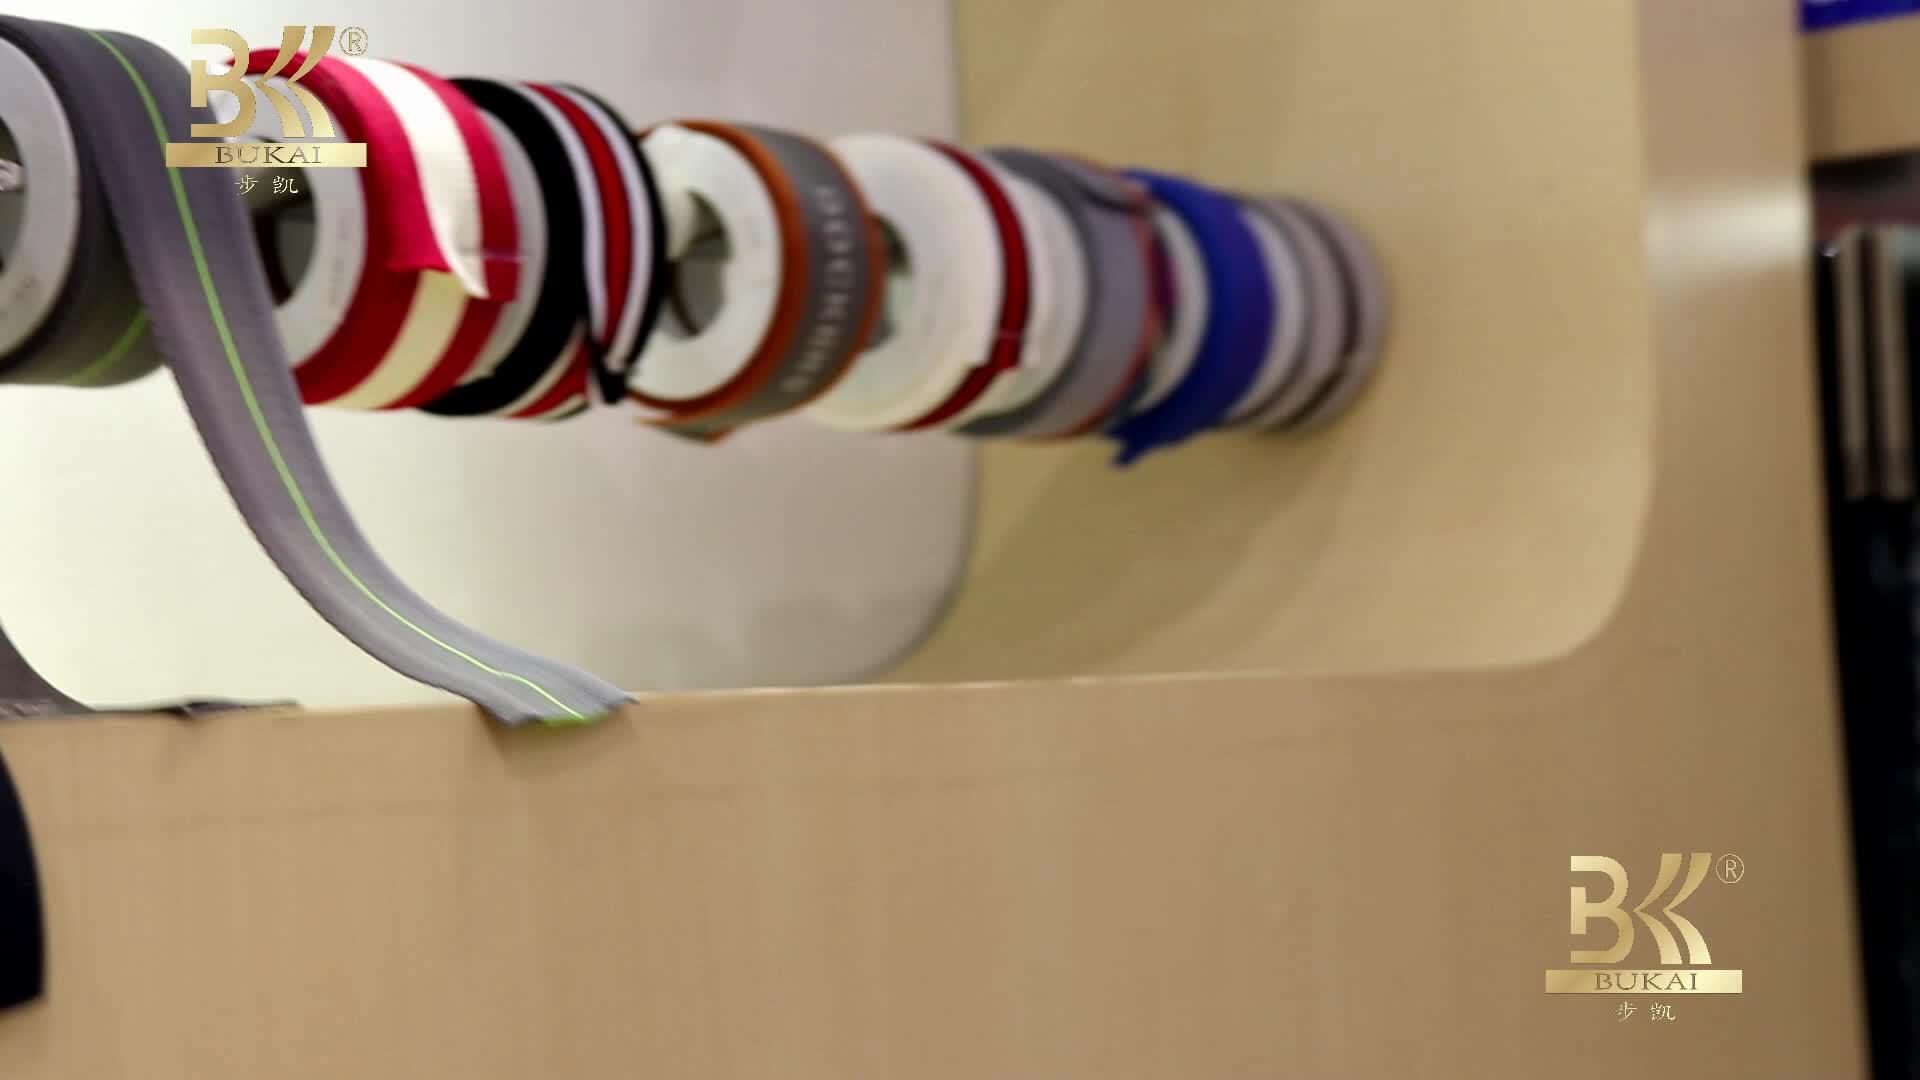 Faixa elástica personalizada tenacidade de alta qualidade para o roupa interior